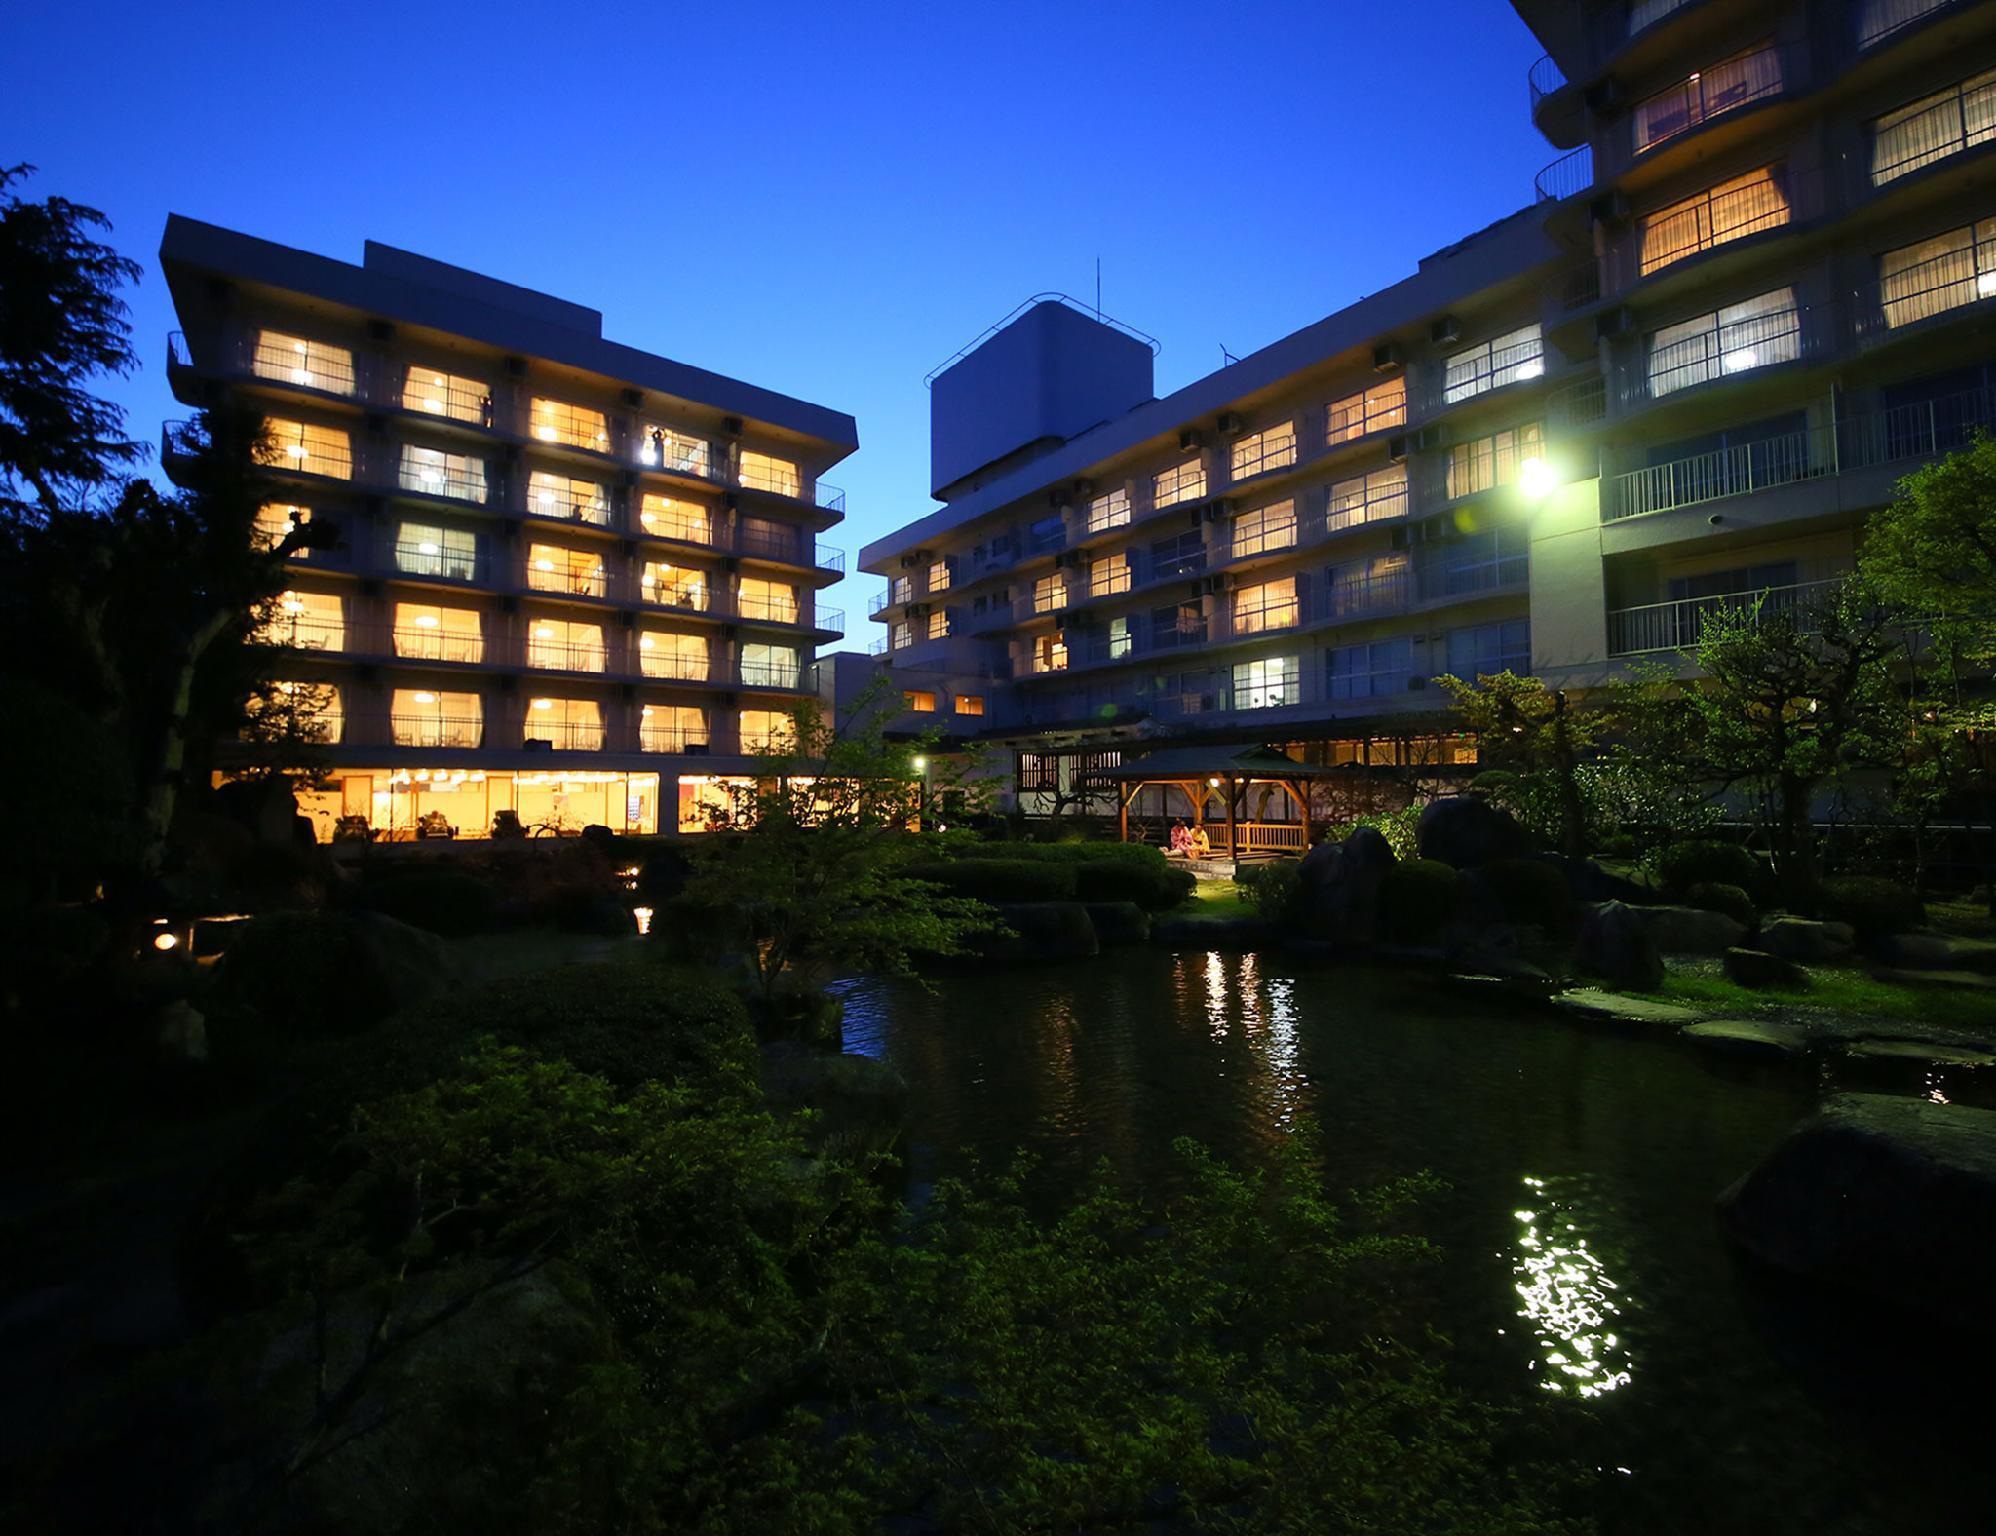 Ooedo Onsen Monogatari Hotel Shinko